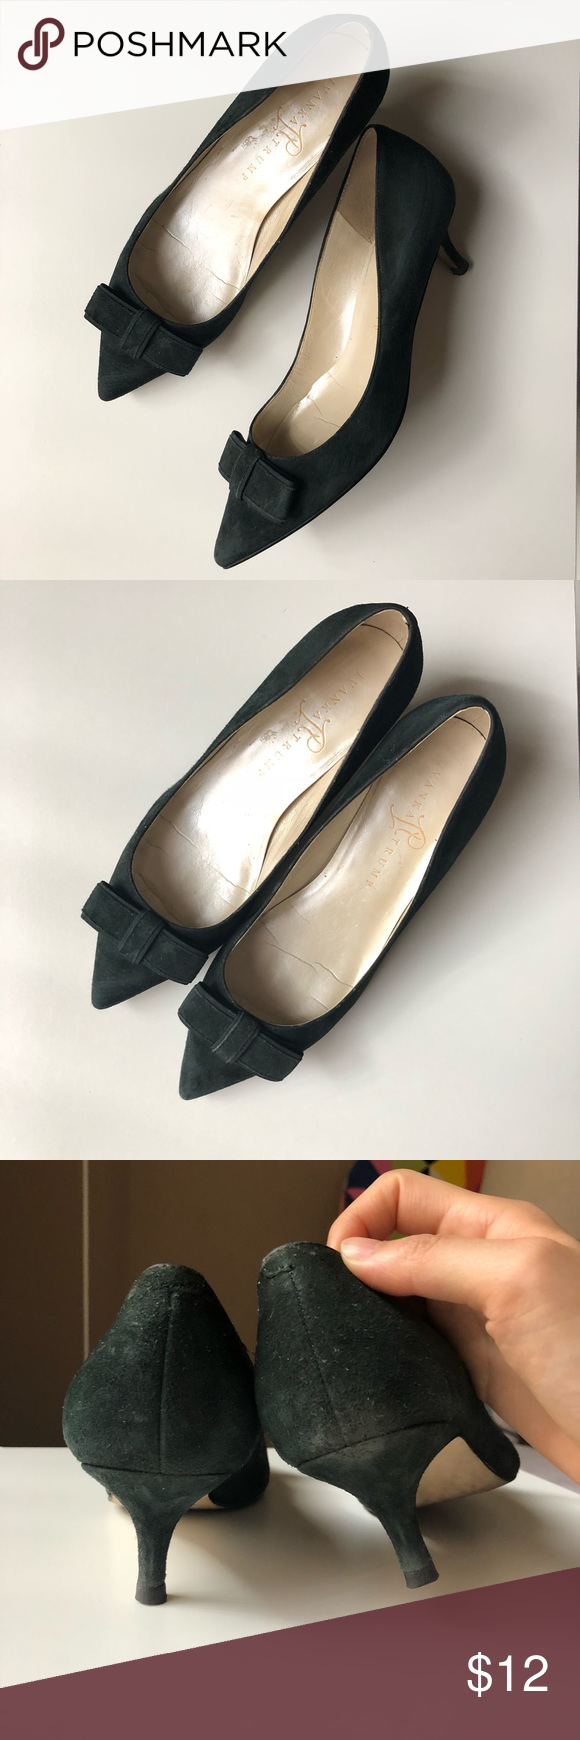 e3f463350818 Ivanka Trump kitten heels green suede bows size 8 Ivanka Trump kitten heels  green suede